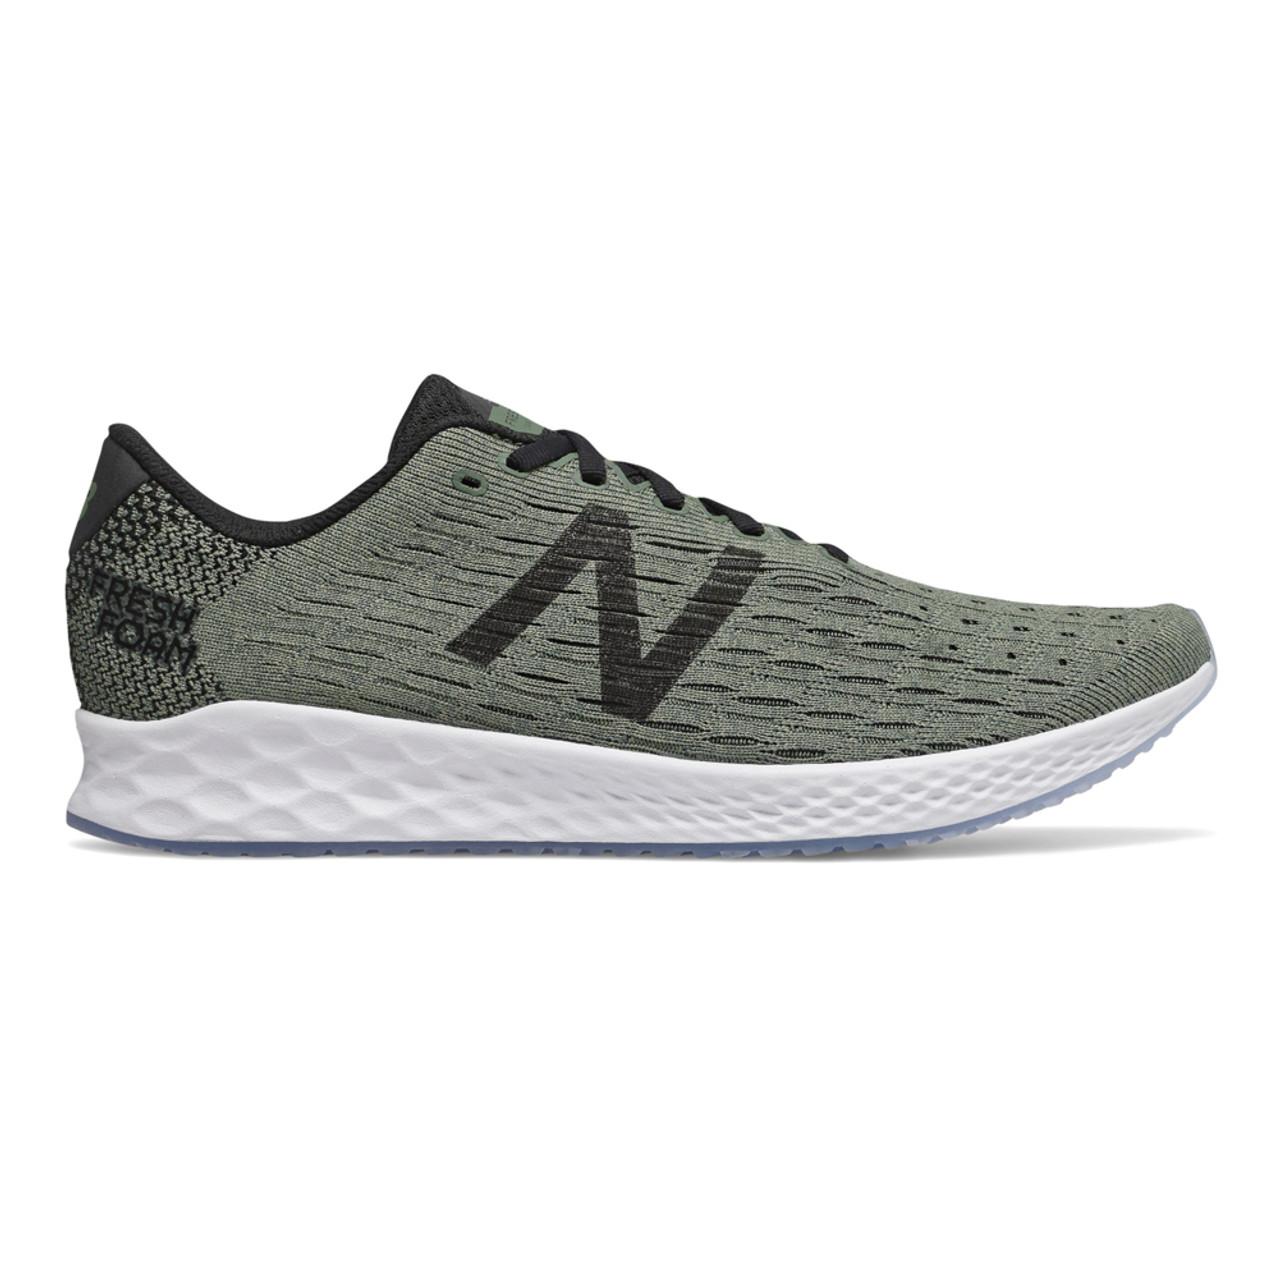 5e8ca9b106 New Balance Men's MZANPMG Running Shoe Mineral Green/Black